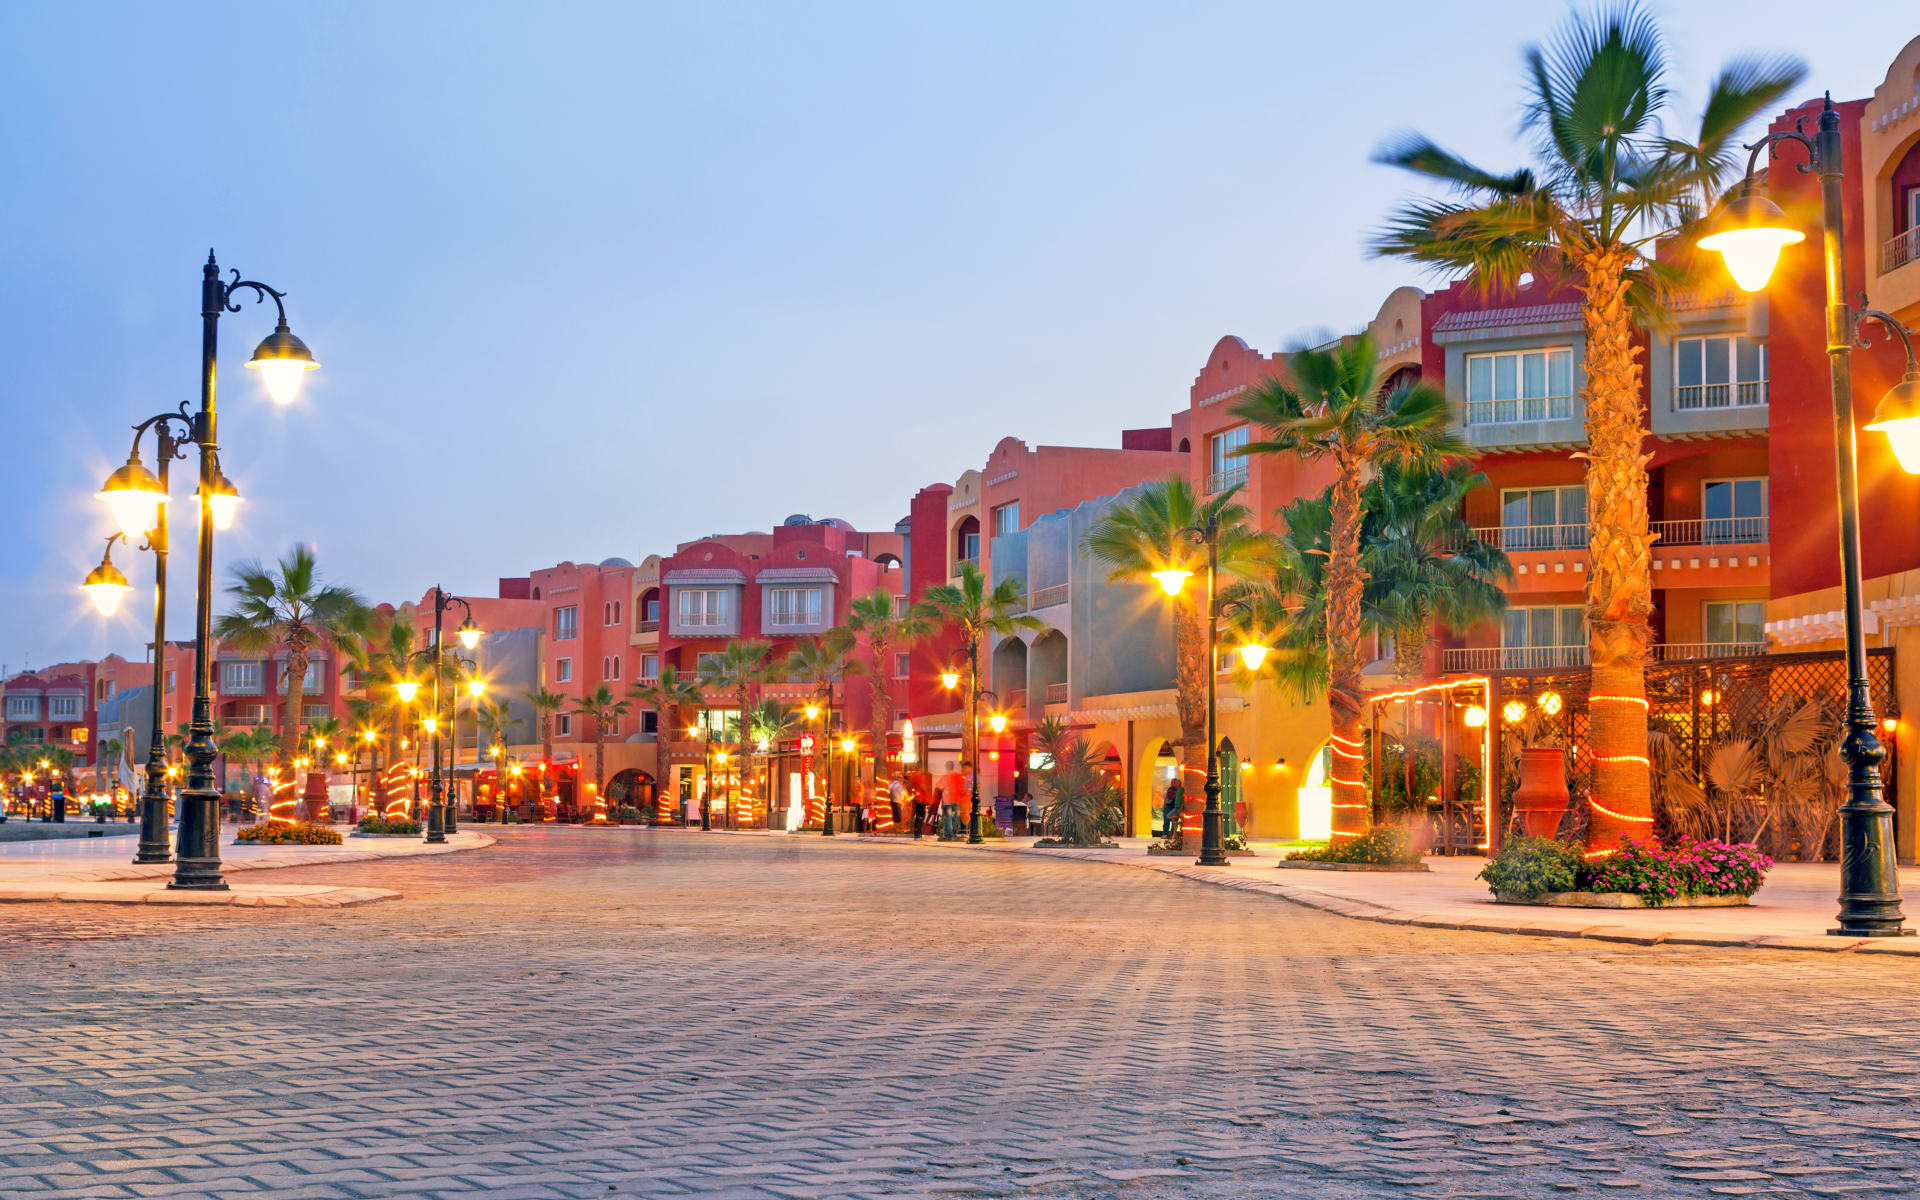 Badeferien im Steigenberger ALDAU Beach Hotel ab Hurghada: Hurghada Marina am Abend